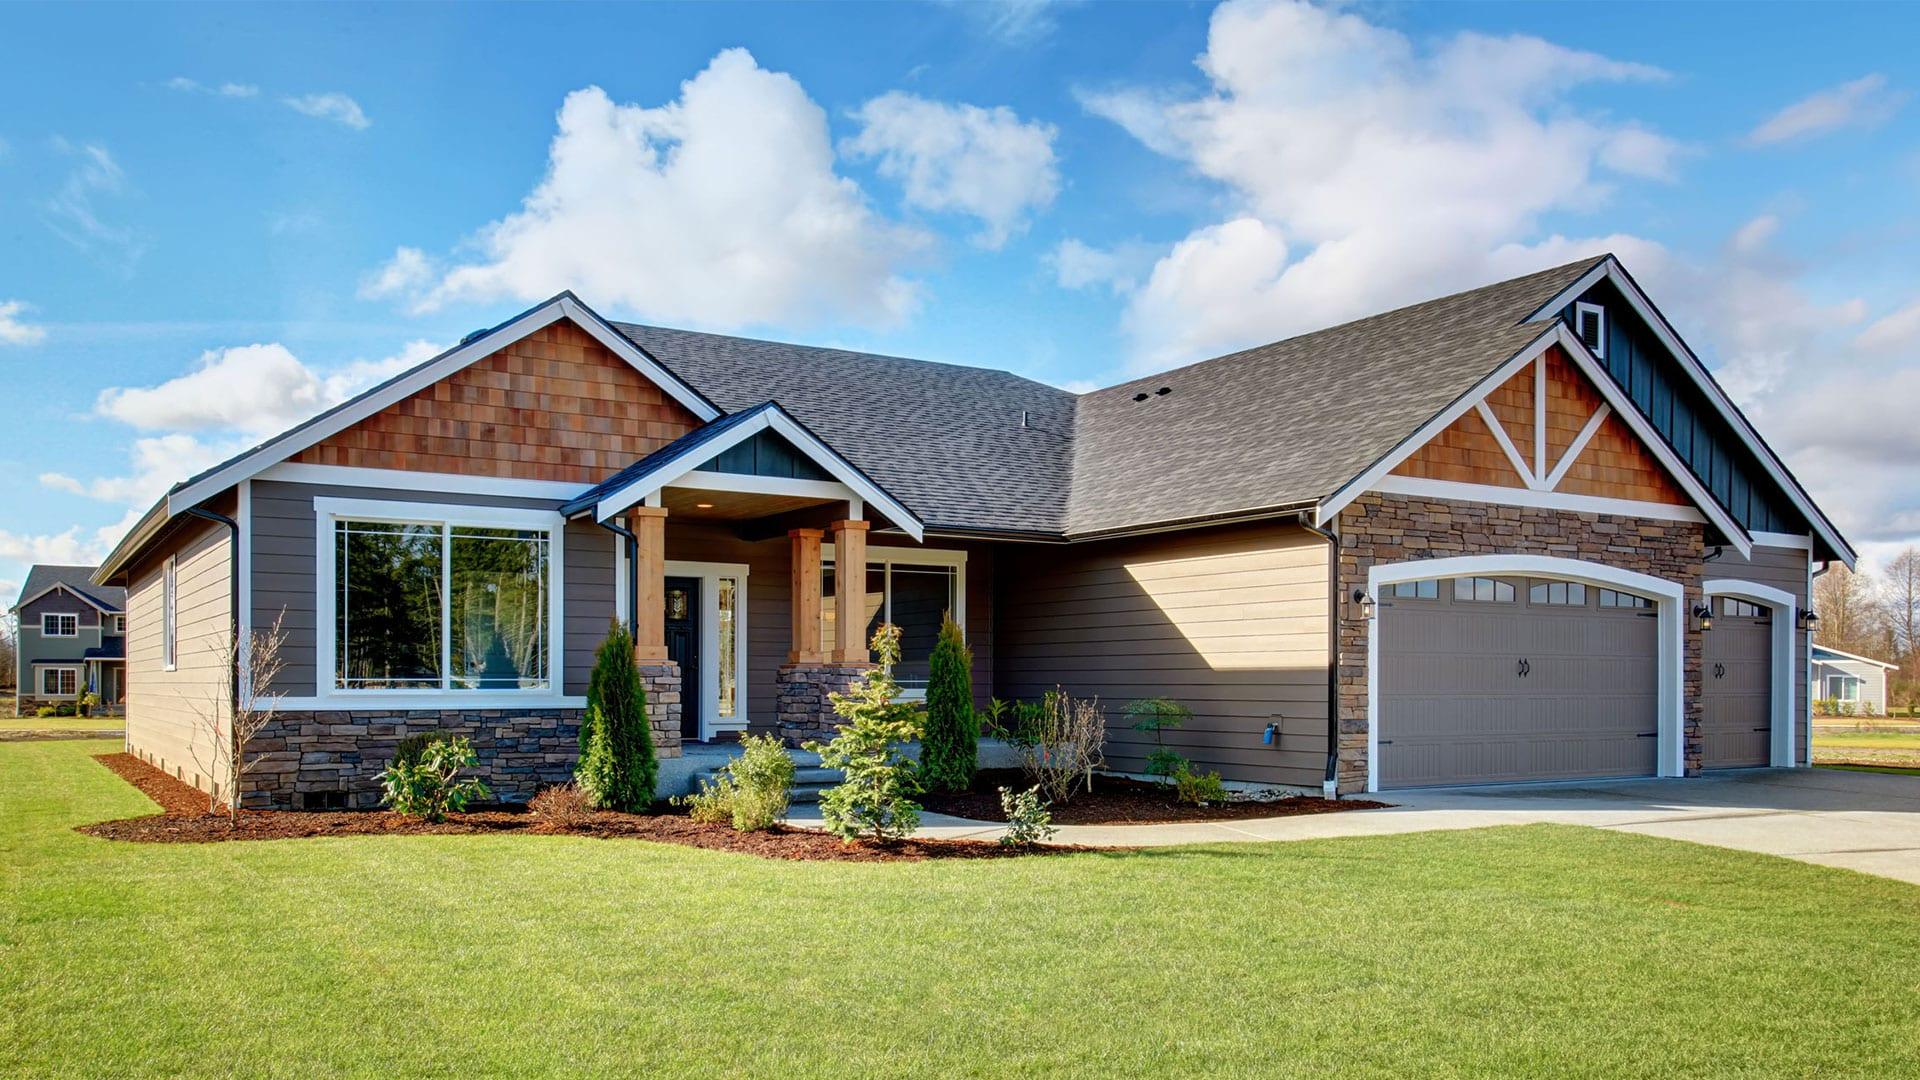 home closing: when do you get your keys?